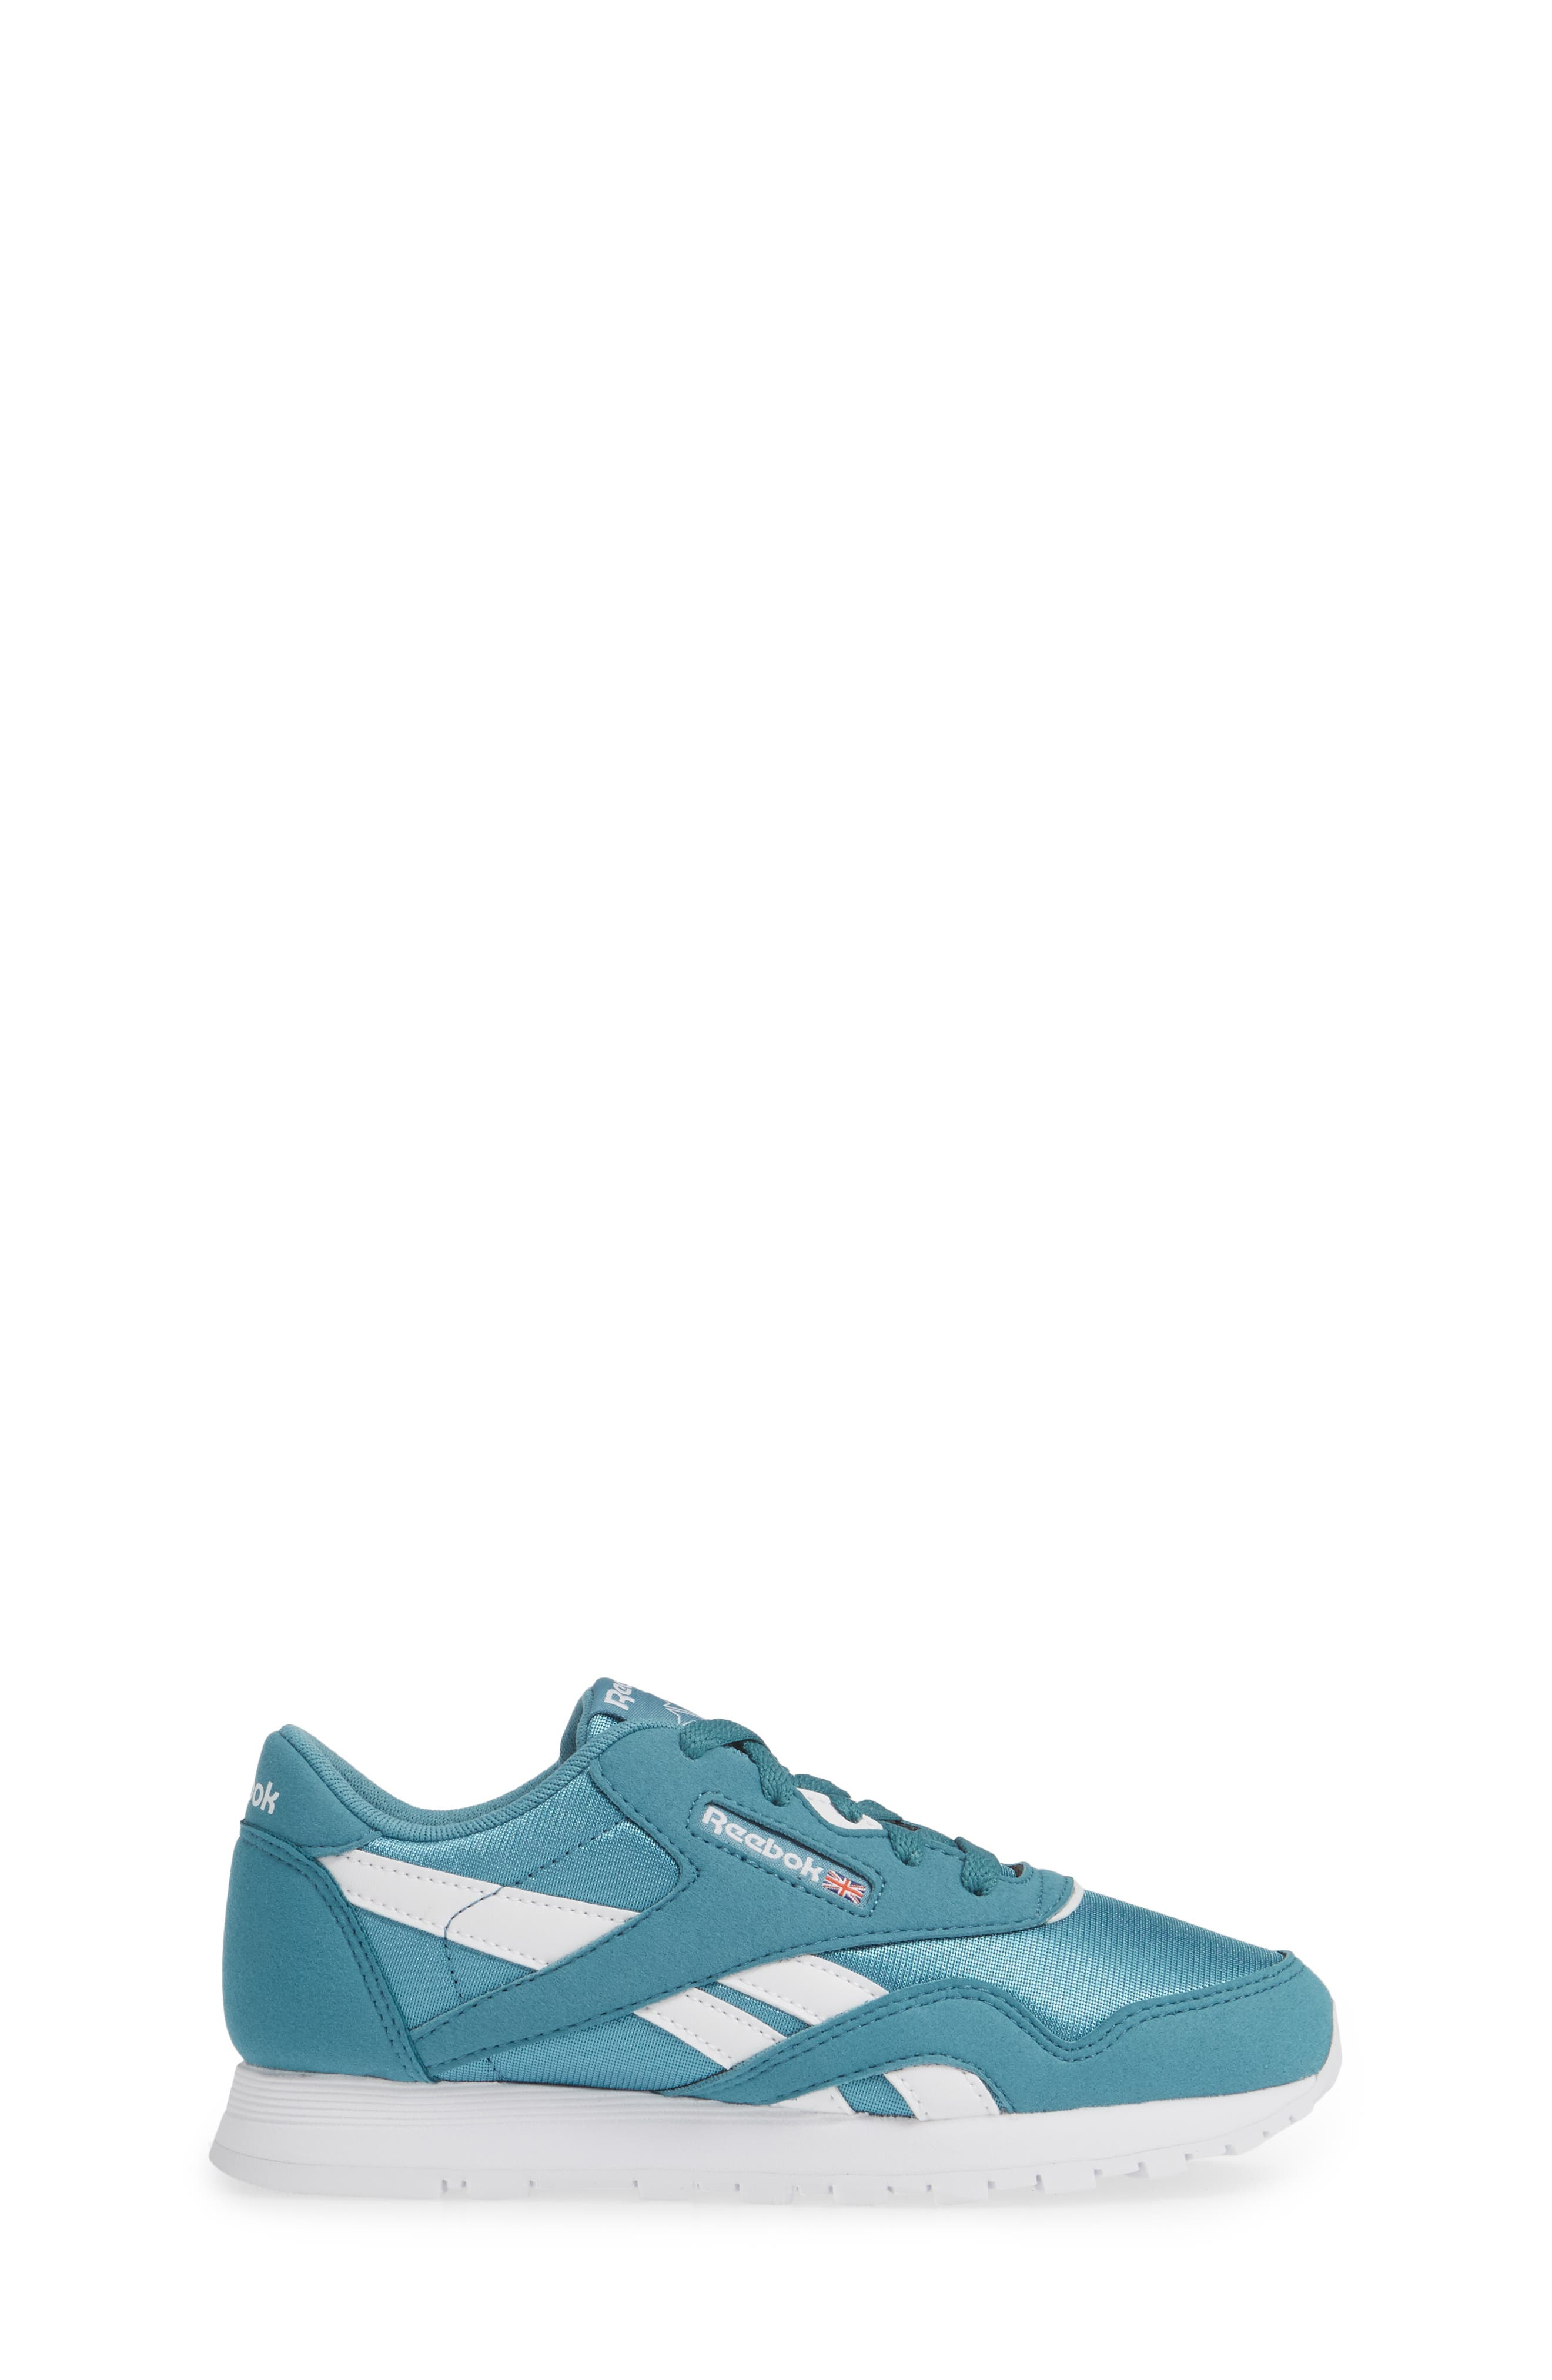 REEBOK, Classic Nylon Sneaker, Alternate thumbnail 3, color, 406